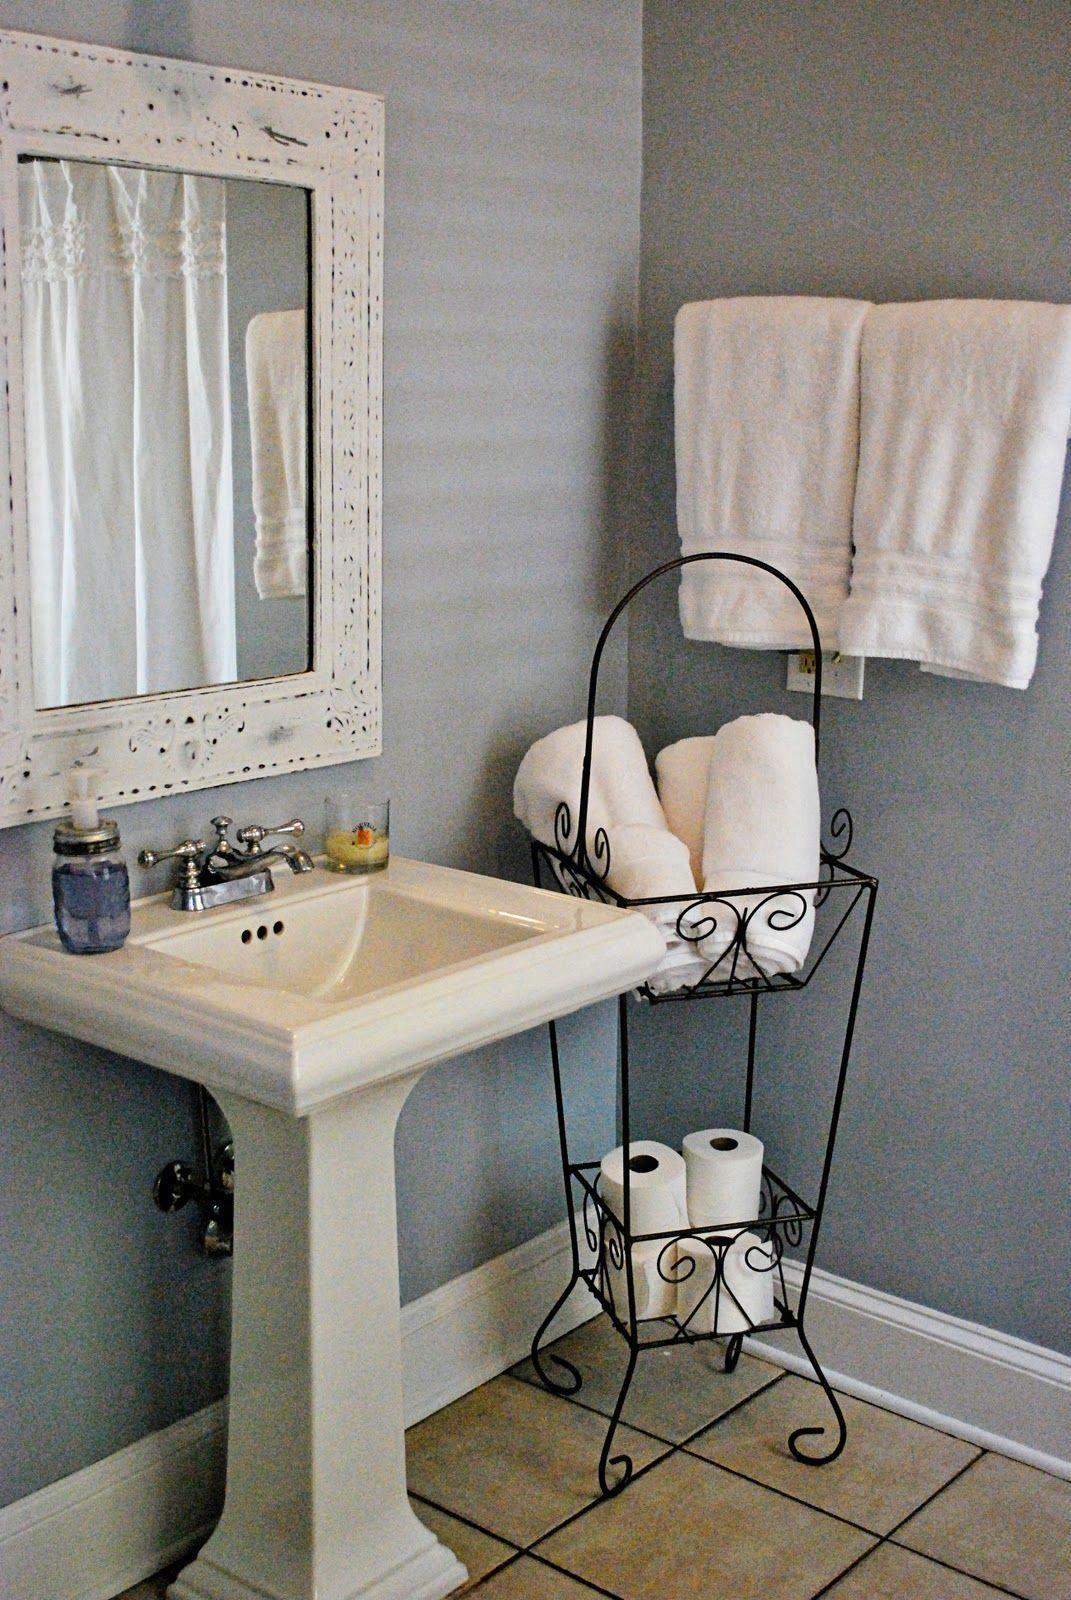 Bathroom Cabinets El Paso Tx Downstairs Bathroom Bathroom Decor Powder Room Ideas Half Baths [ jpg ]